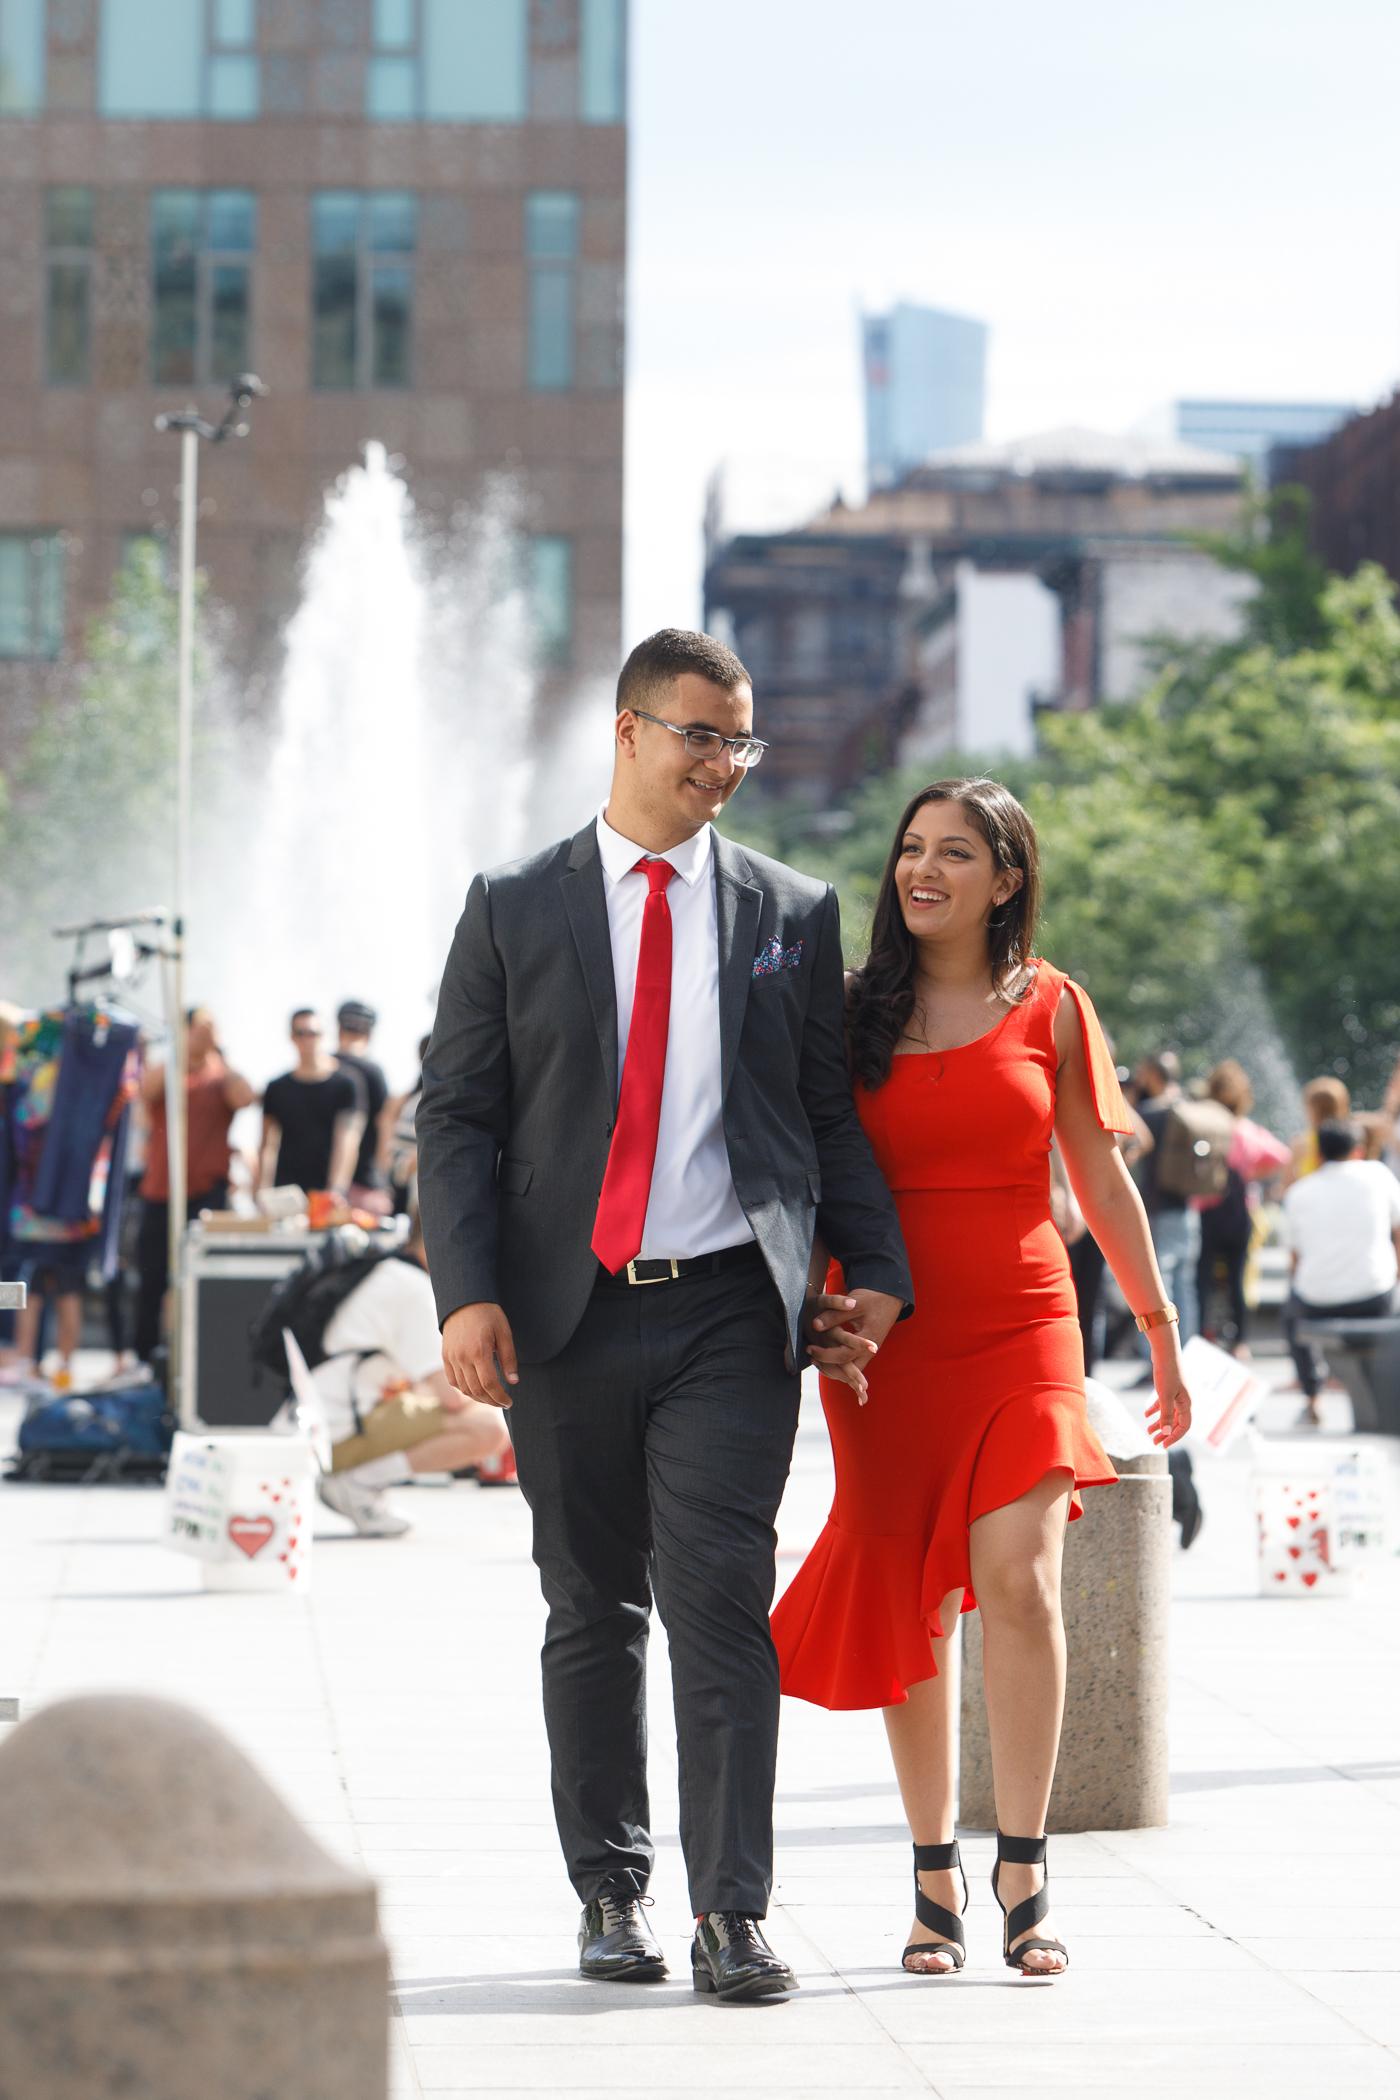 Kiro Rebecca Washington Square Park Marriage Proposal _ Jonathan Heisler _ 6152019 _035.jpg